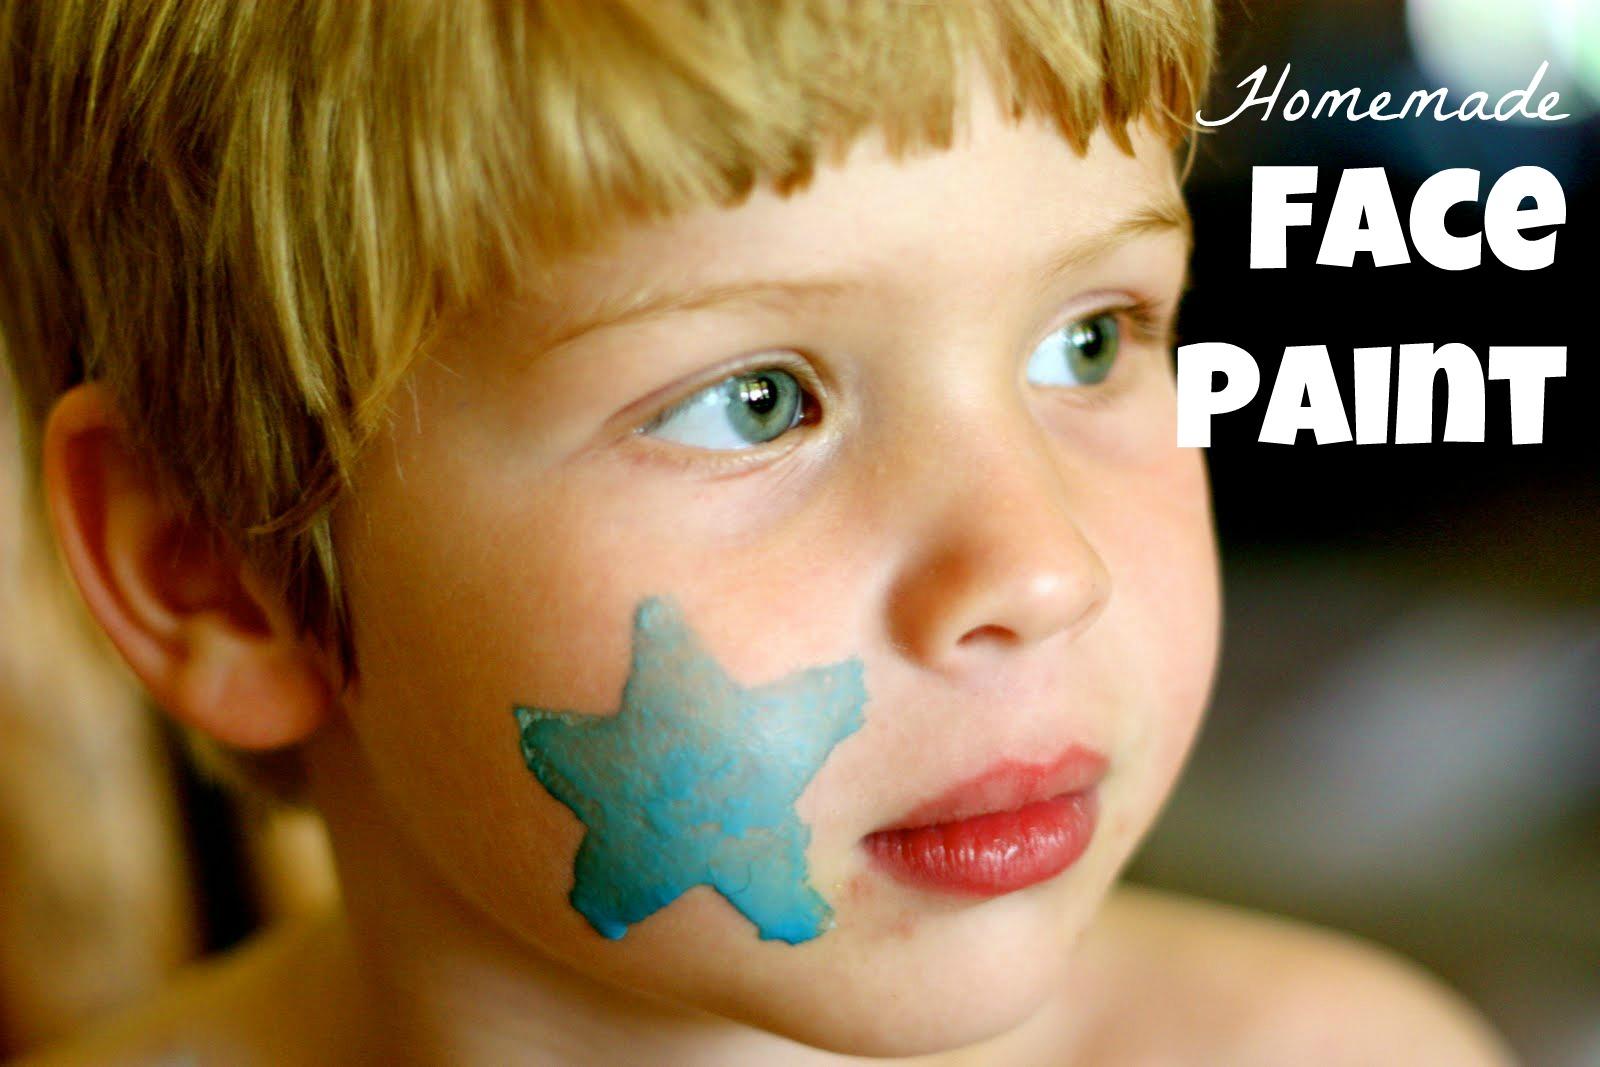 Homemade Face-Paint